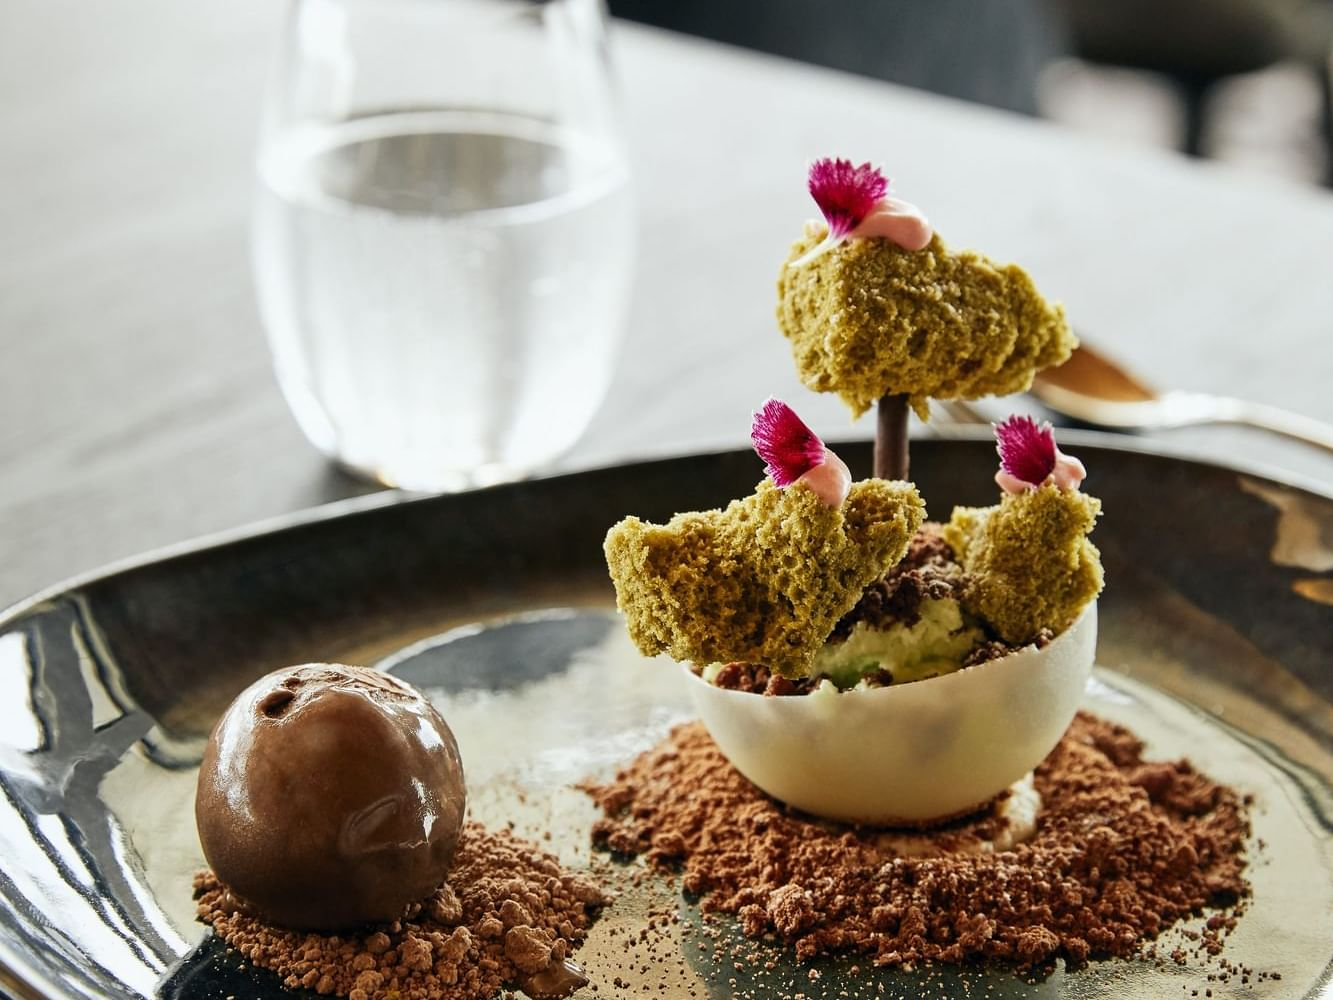 Dessert served in Infinity Restaurant at Daydream Island Resort